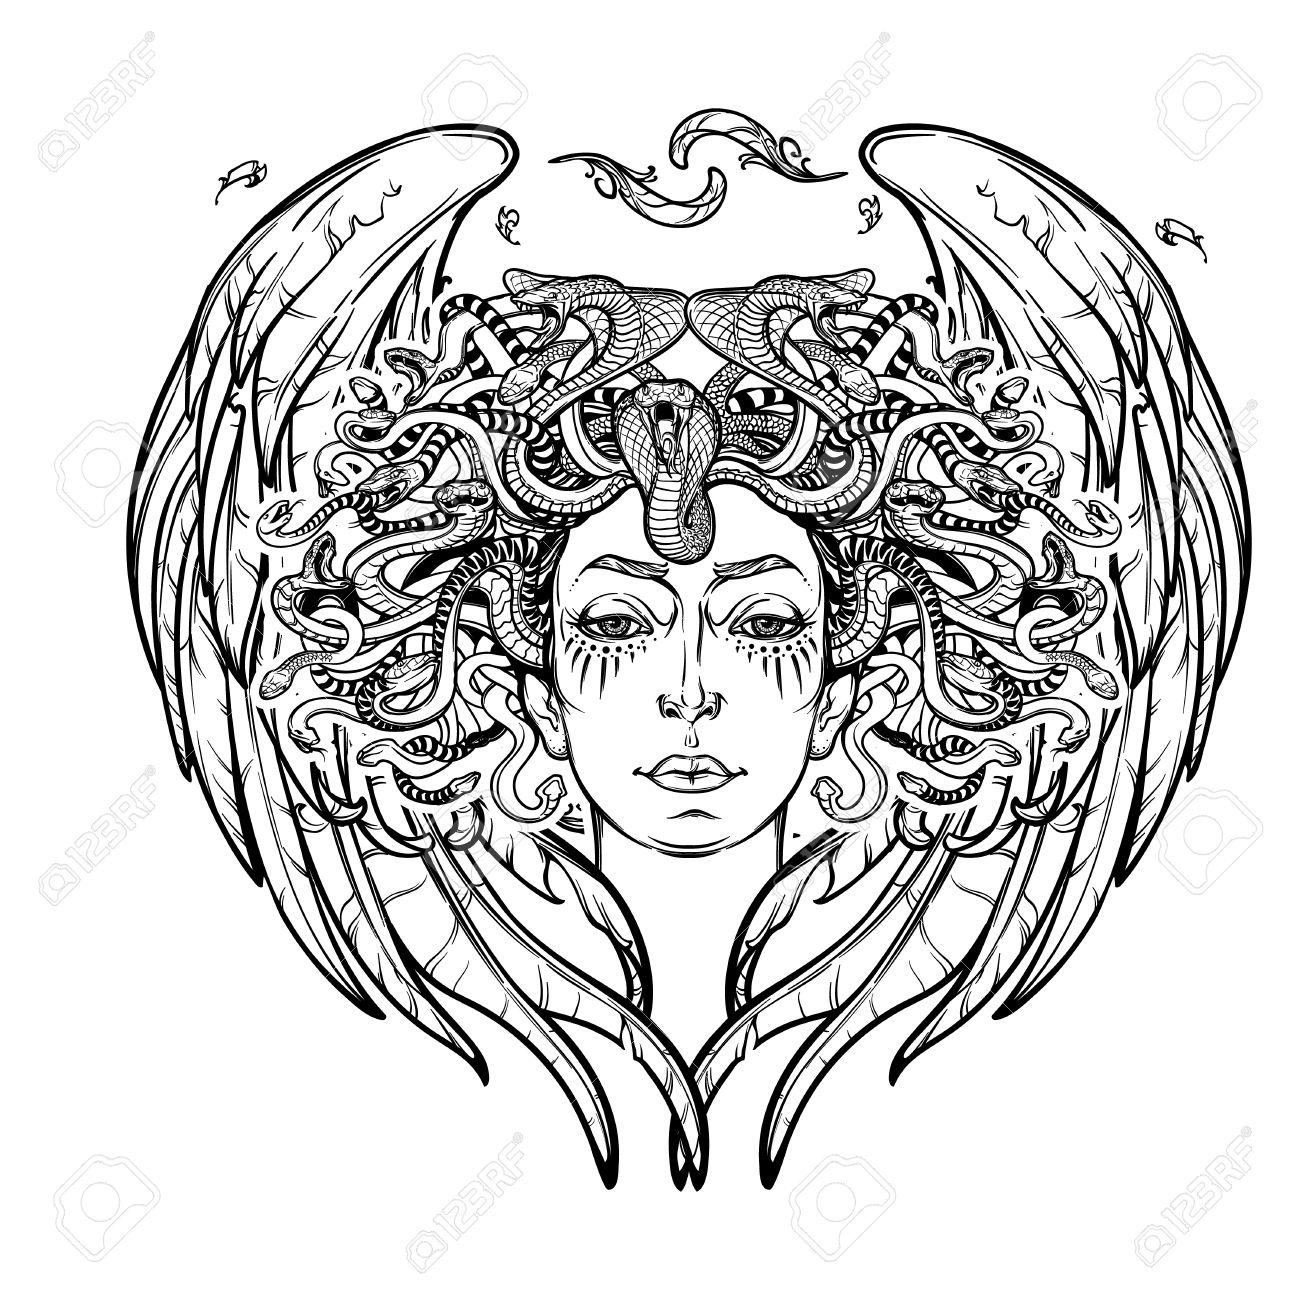 1300x1300 Medusa Gorgon.ncient Greek Mythological Creature With Face